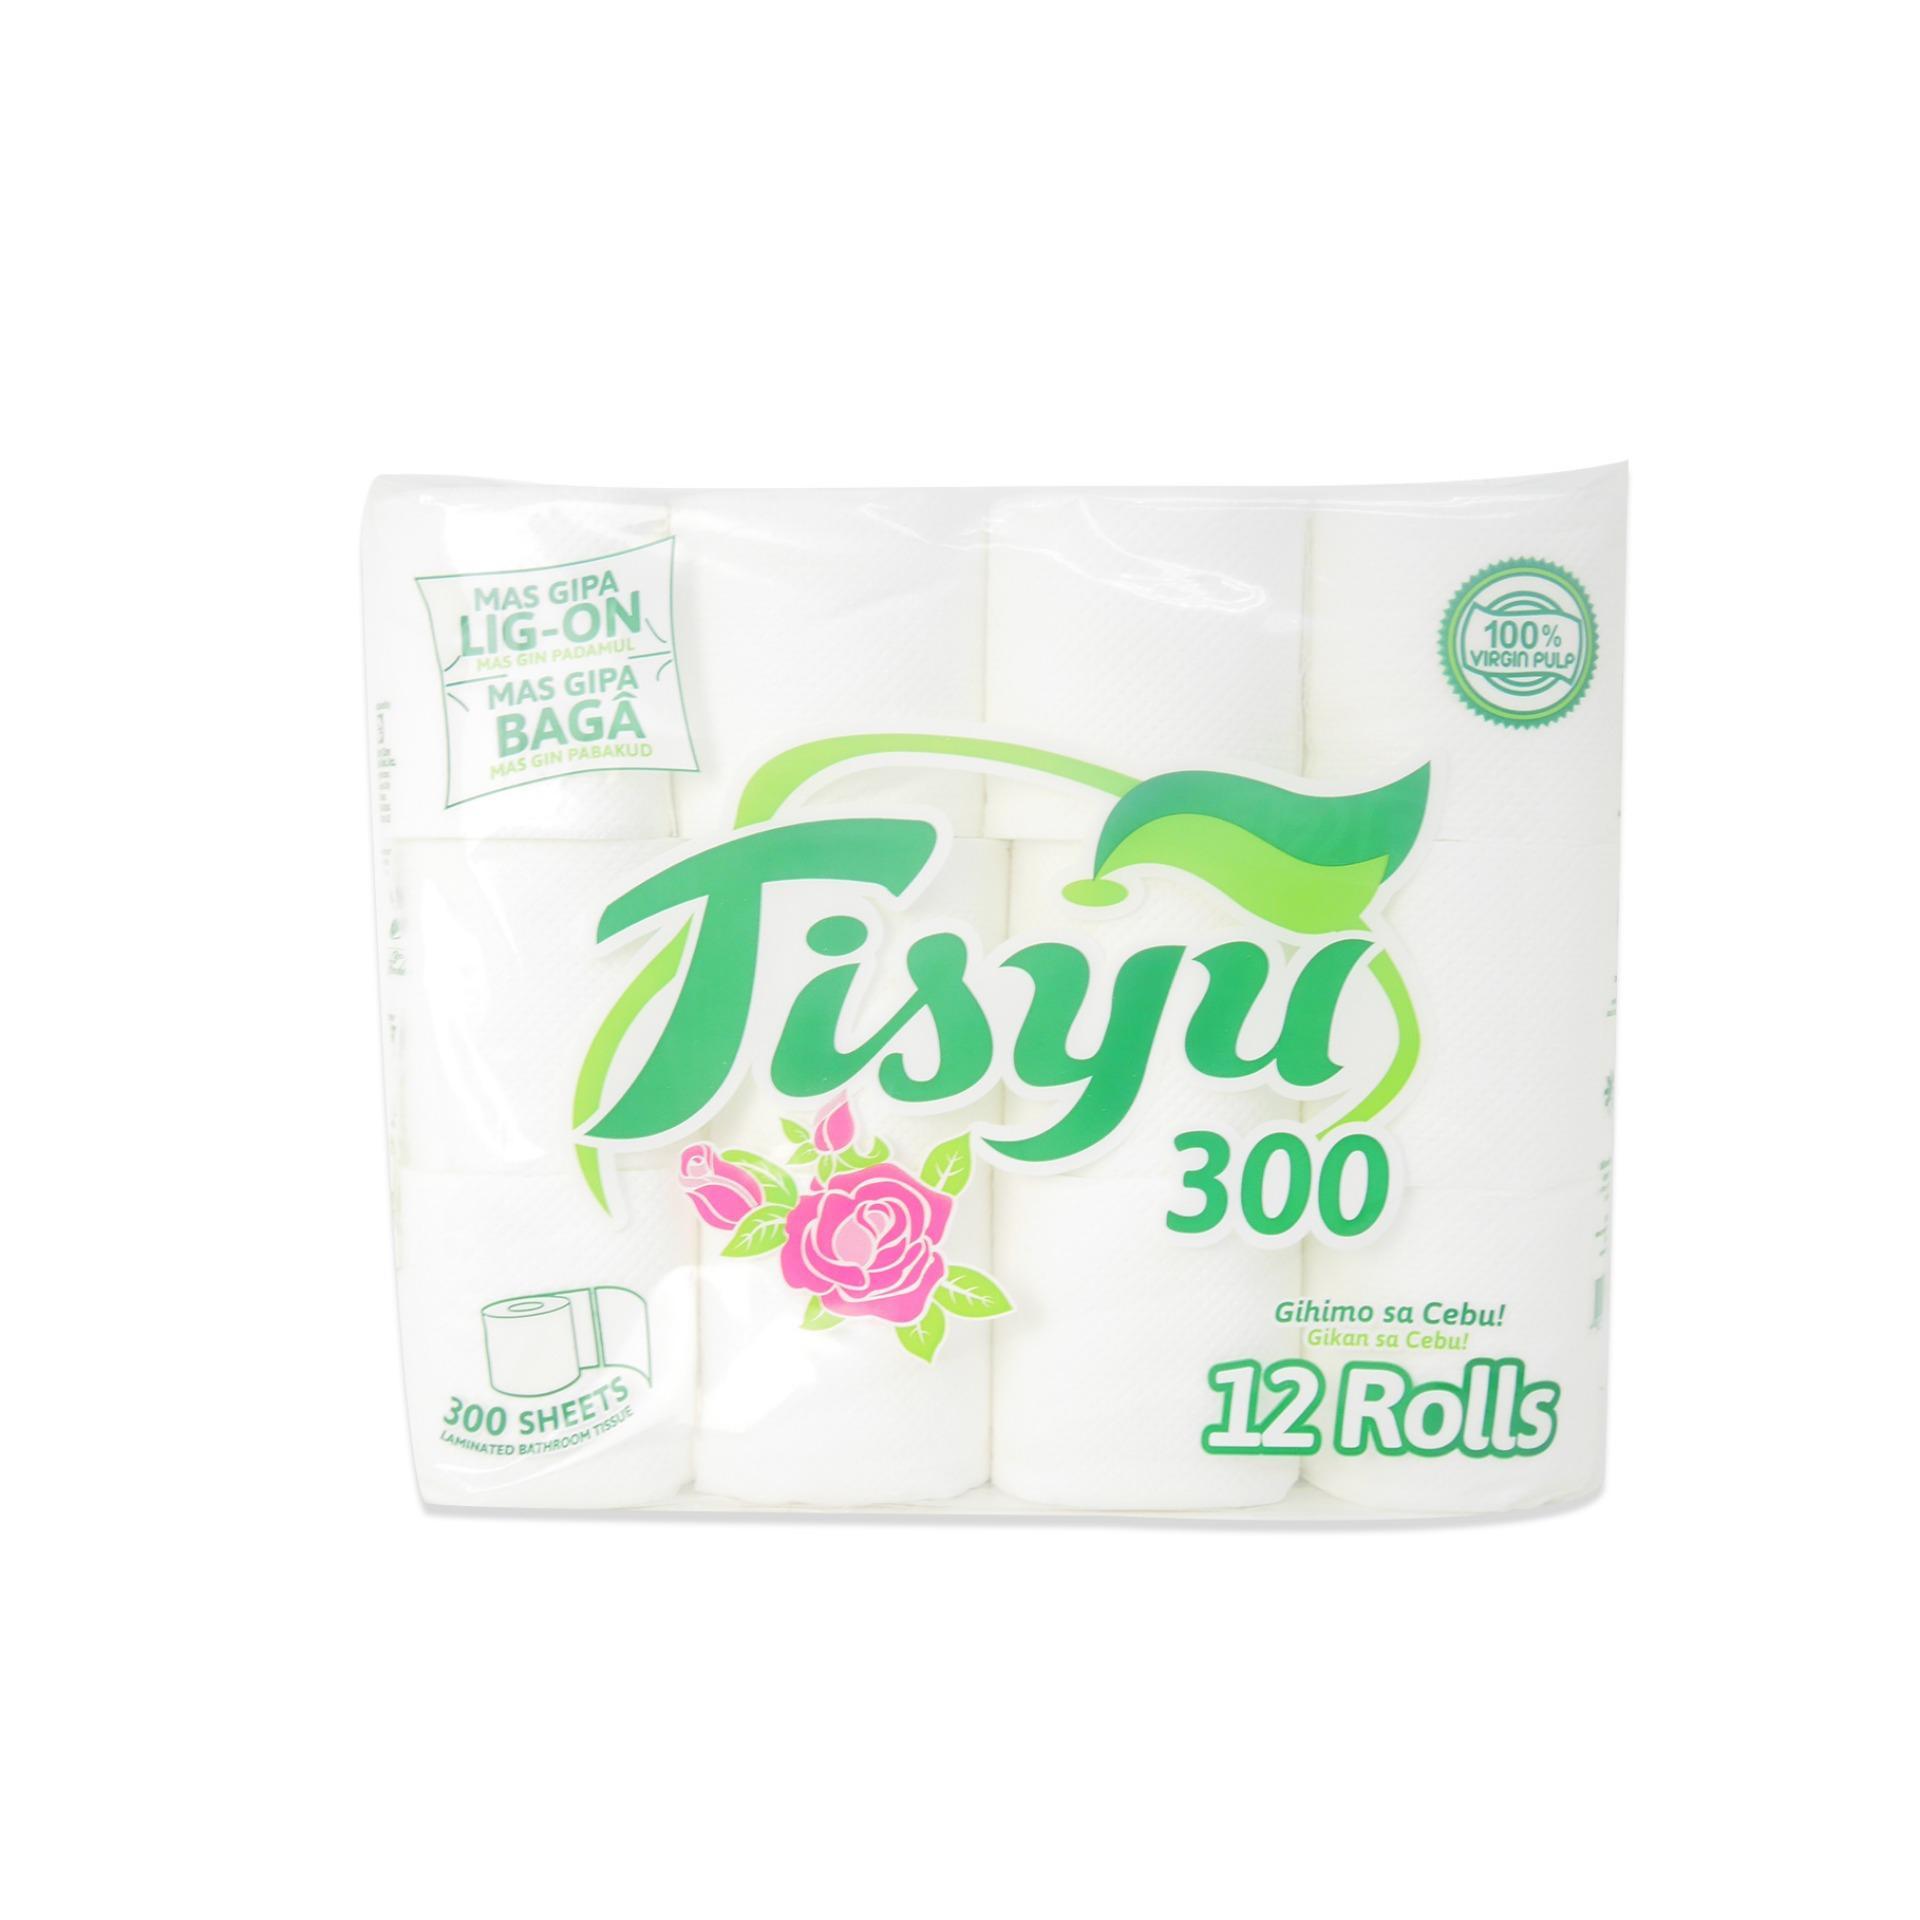 Tisyu 300 Sheets Laminated Bathroom Tissue (12 Rolls) 160770 w45 Philippines